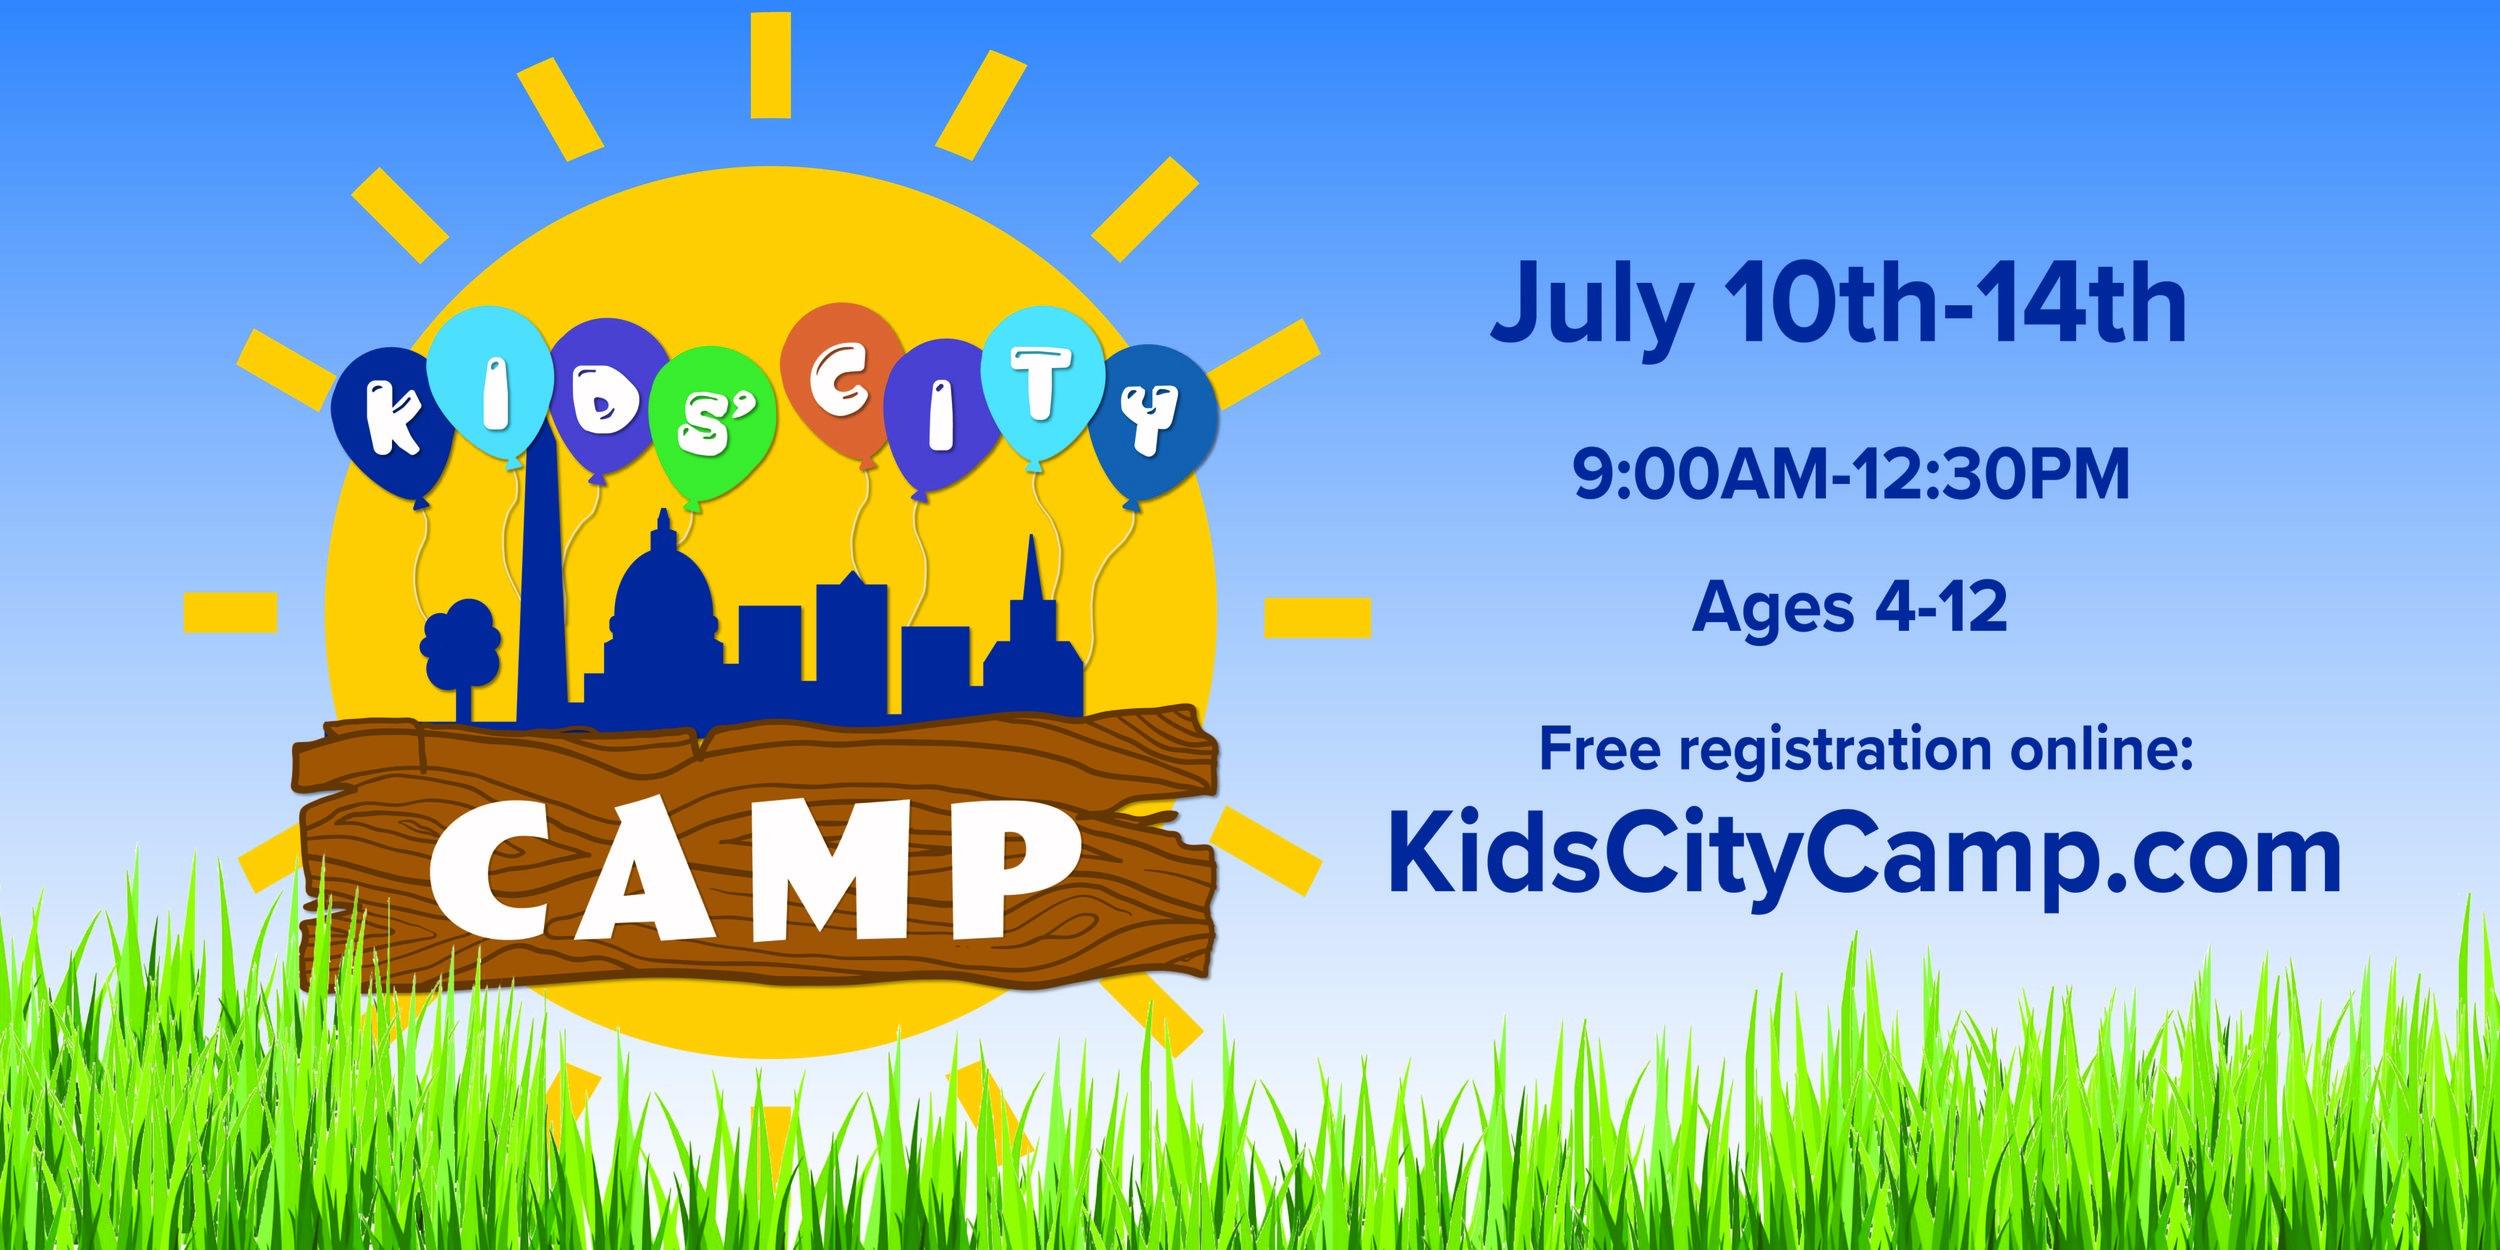 Kidscitycampbanner-01.jpg